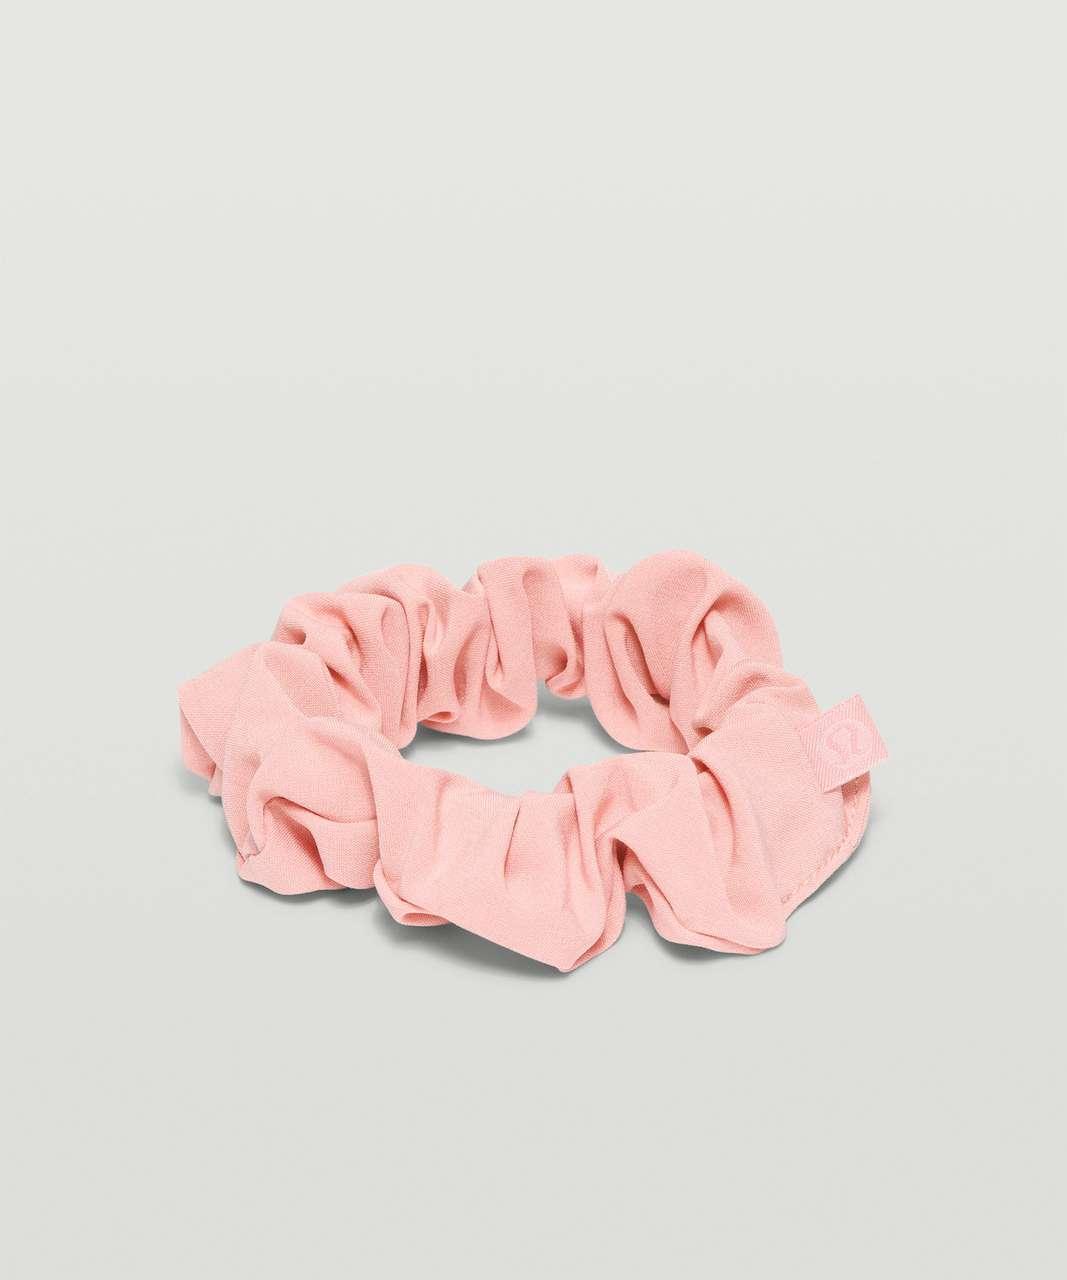 Lululemon Uplifting Scrunchie - Pink Puff